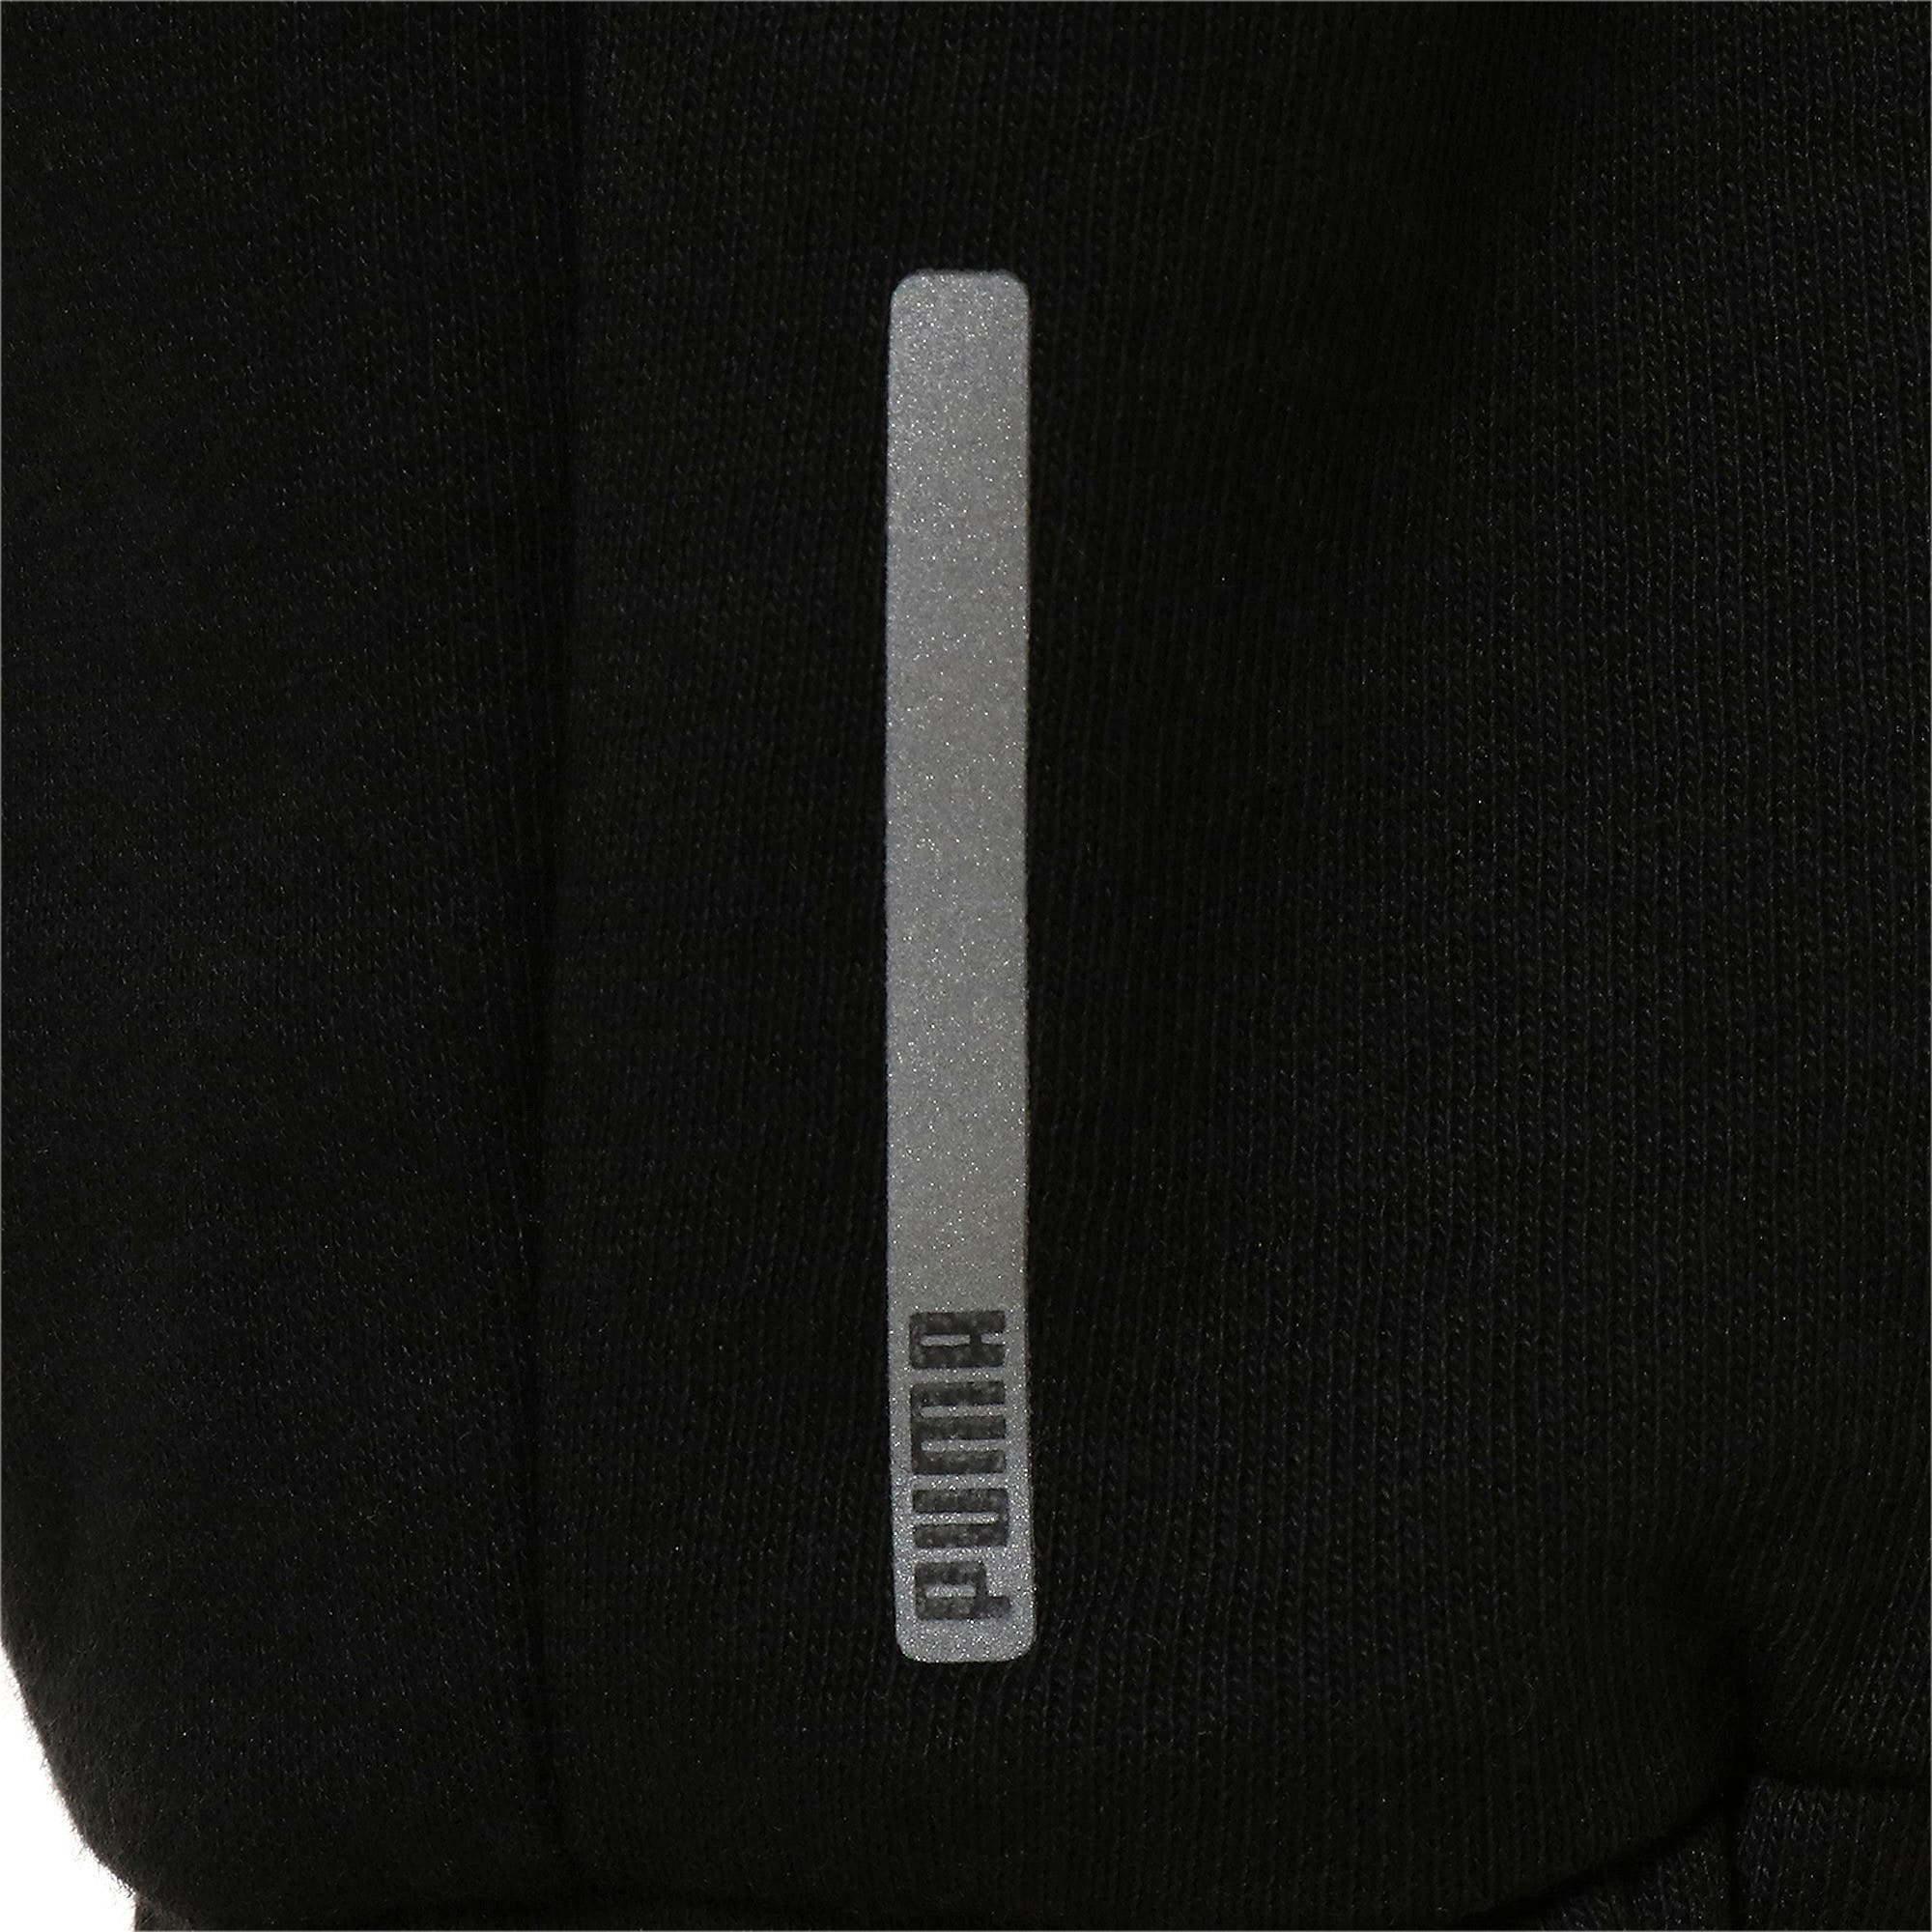 Thumbnail 12 of フィール イット ウィメンズ スウェットパンツ, Puma Black, medium-JPN